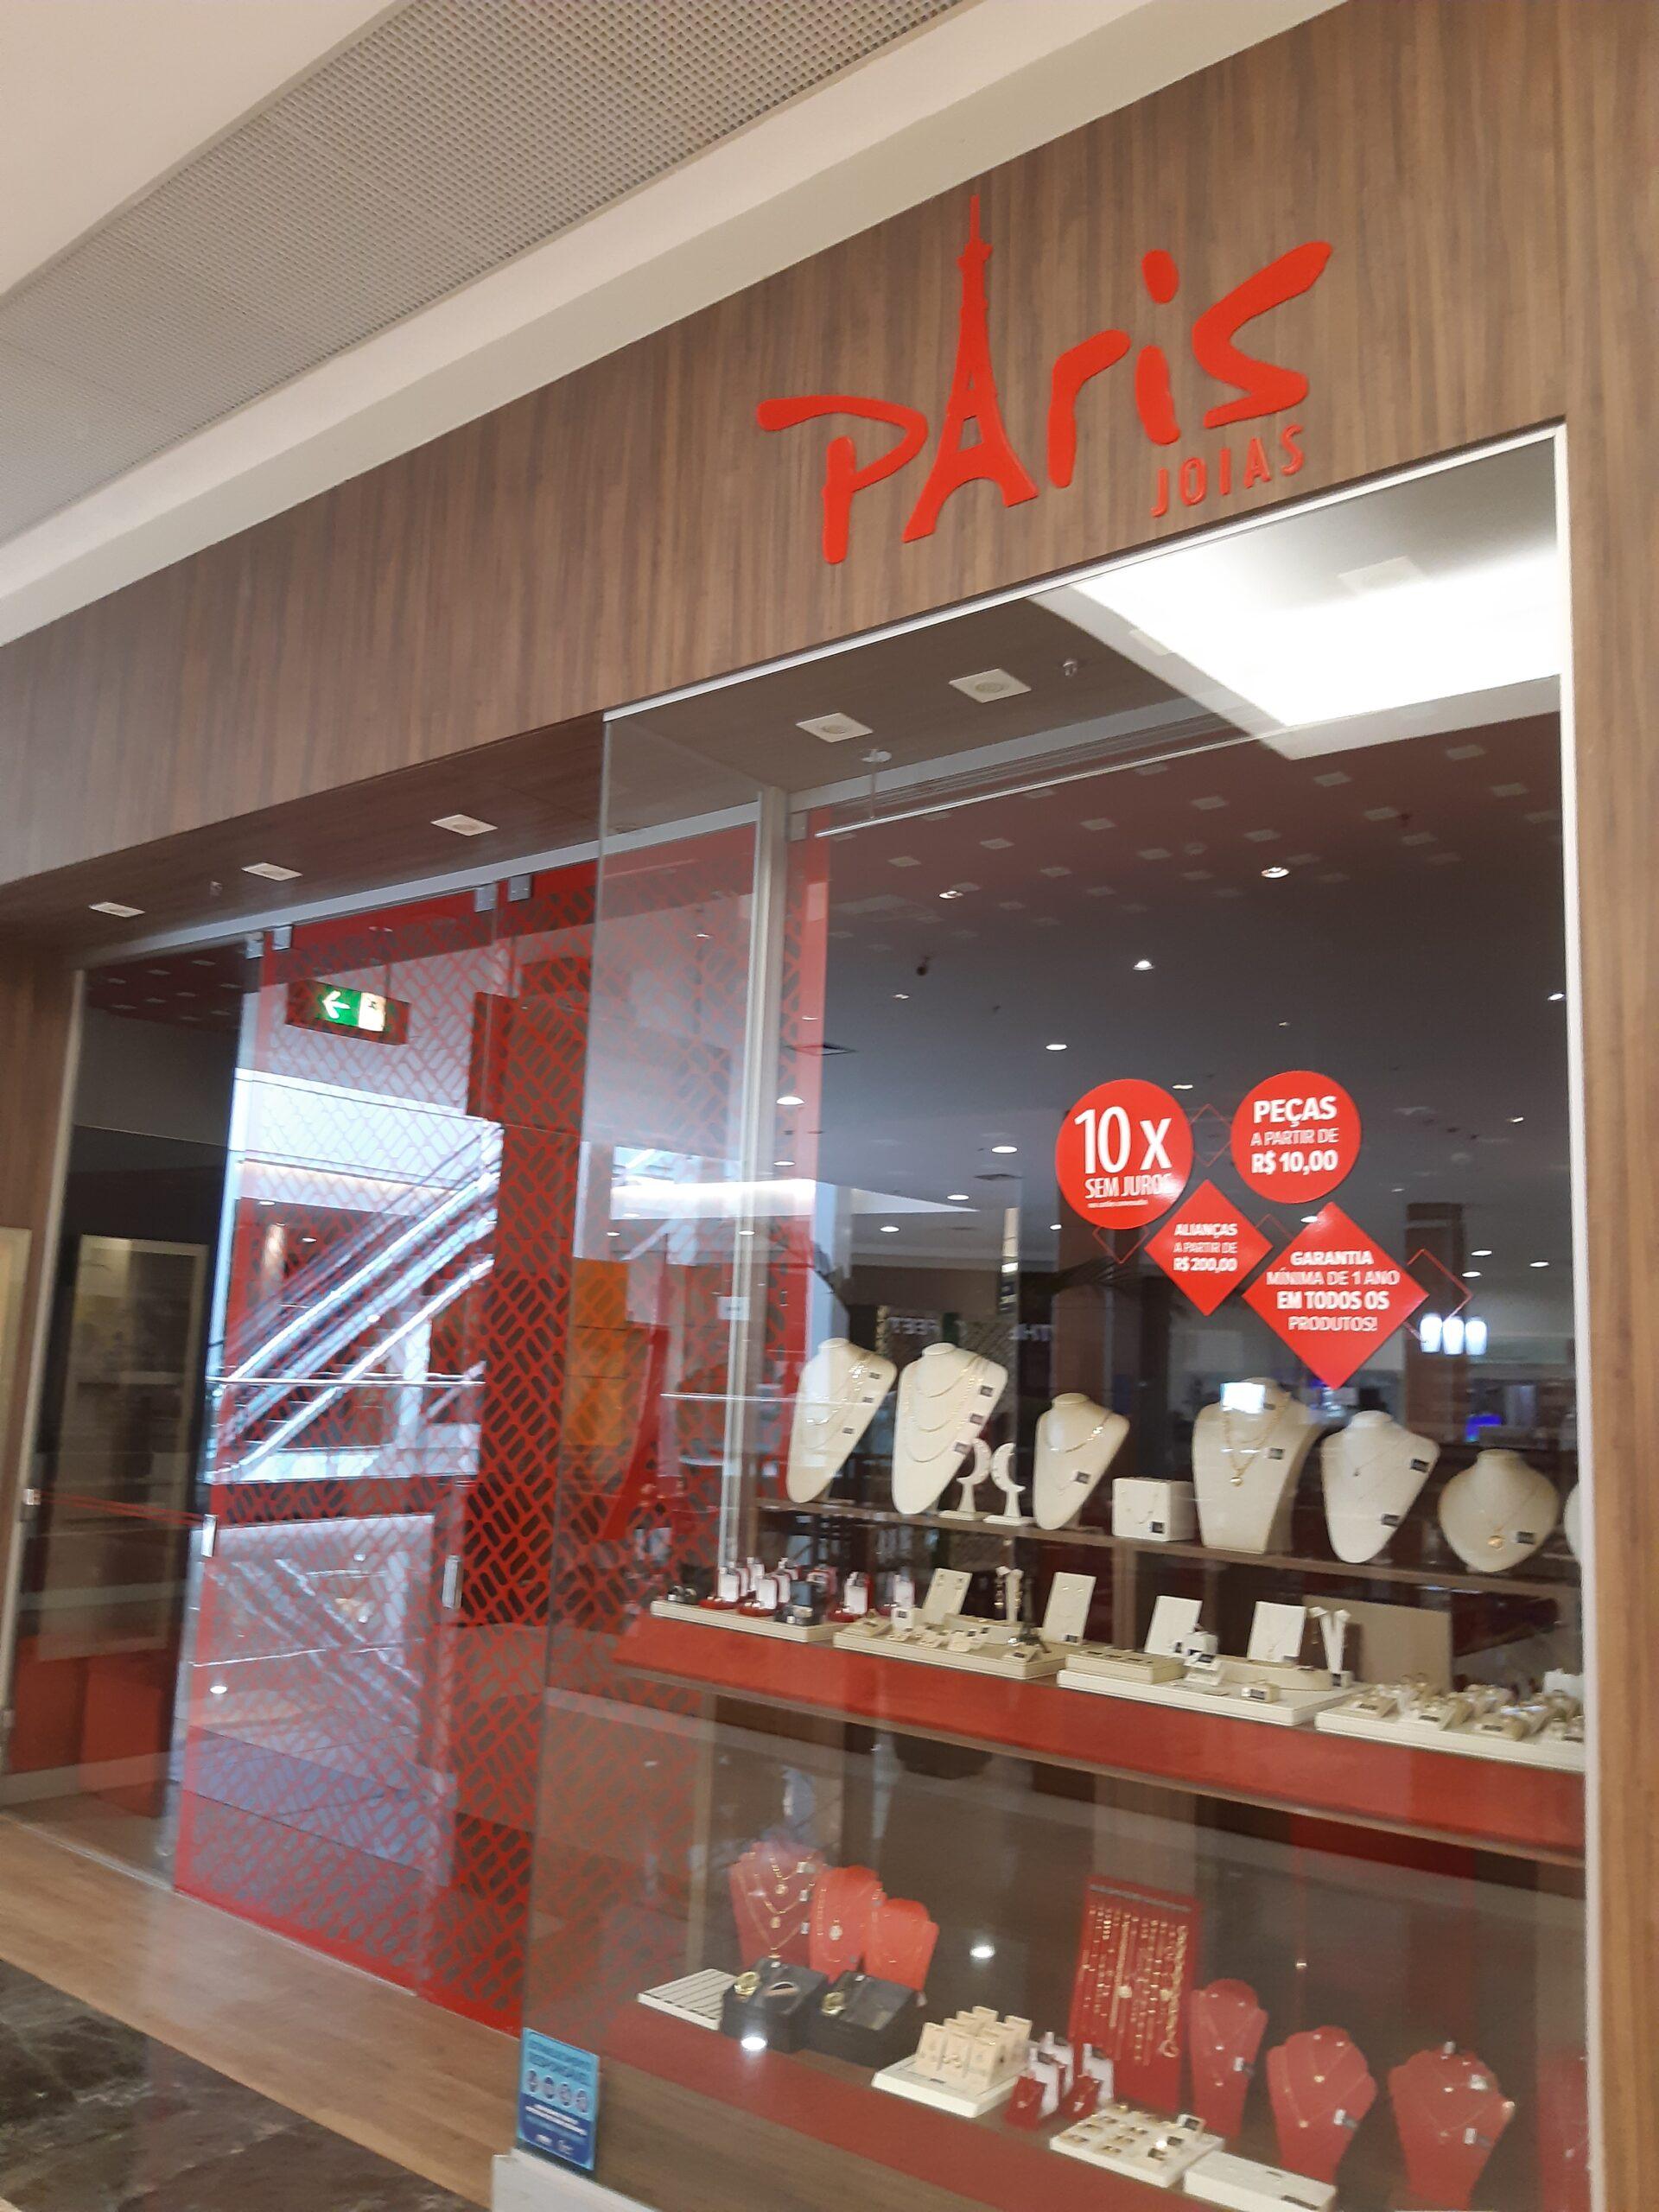 Paris Joias Taguatinga Shopping, Comércio Brasilia